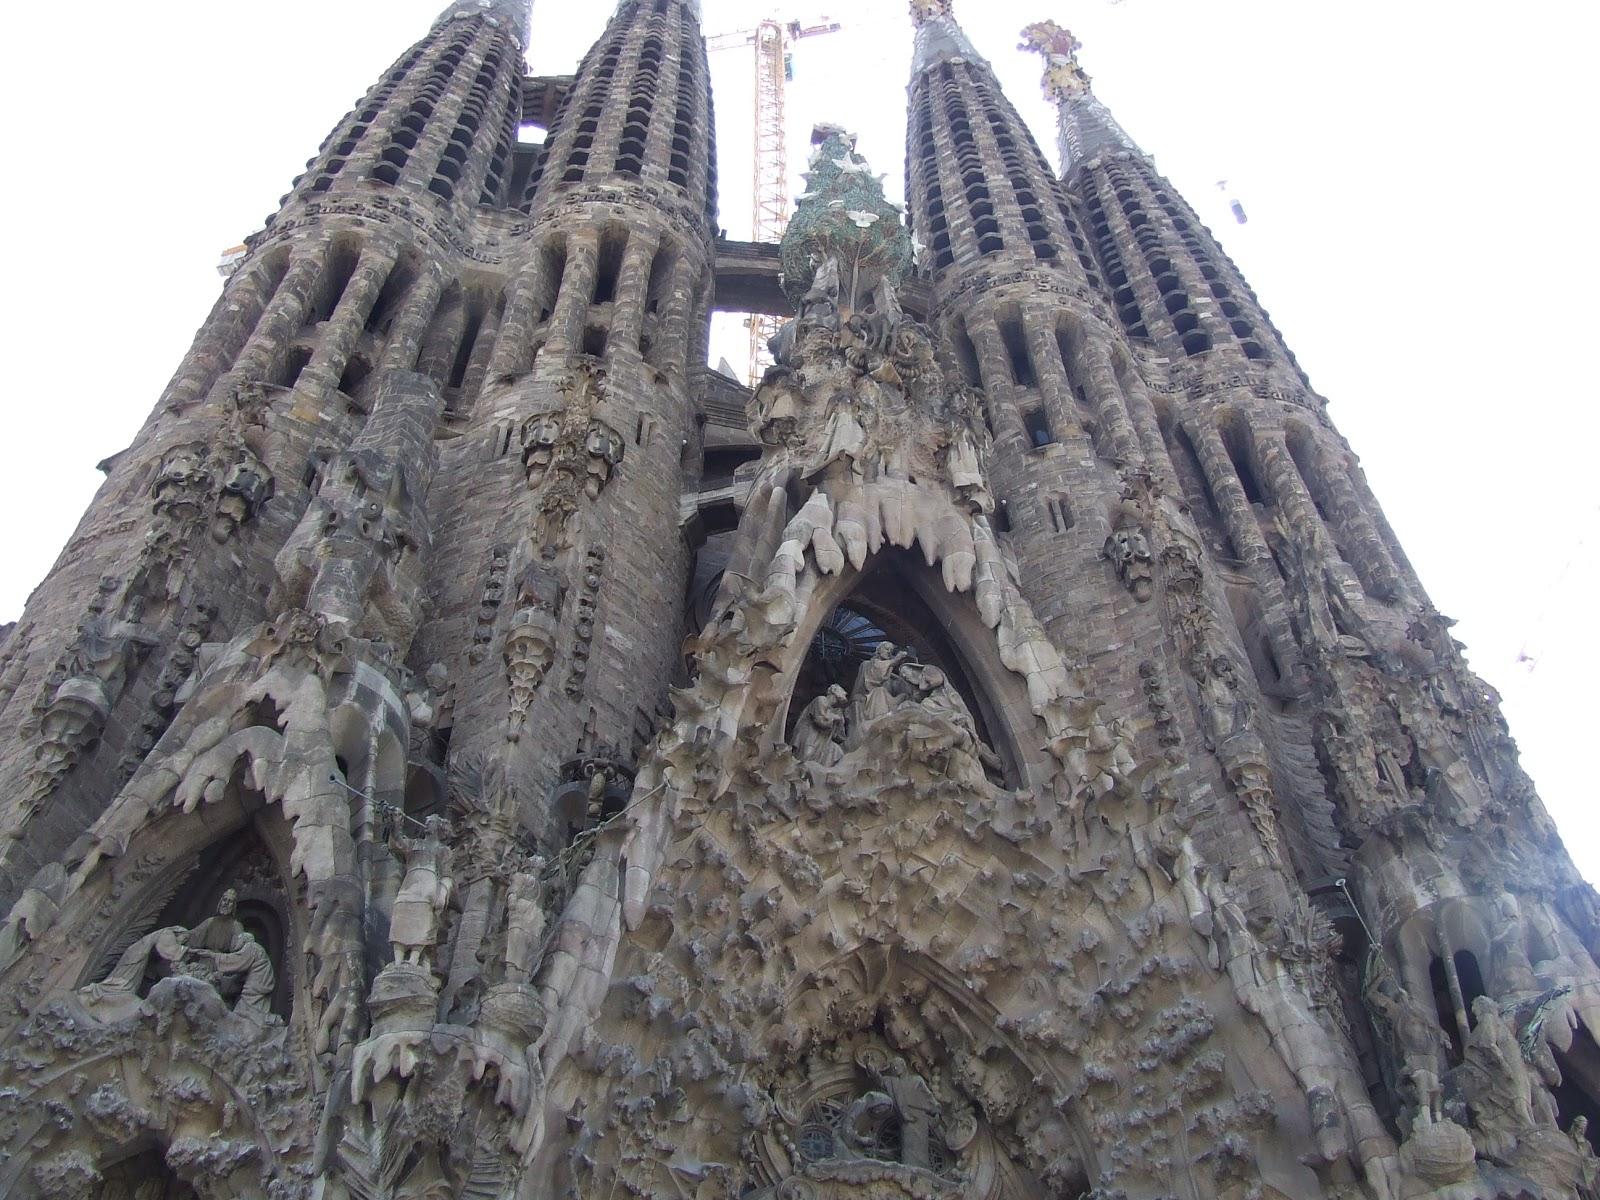 http://3.bp.blogspot.com/-L2ZszN5-PJA/Tb70qaxDM9I/AAAAAAAABcM/2ML-tUkz5uU/s1600/Barcelona.JPG